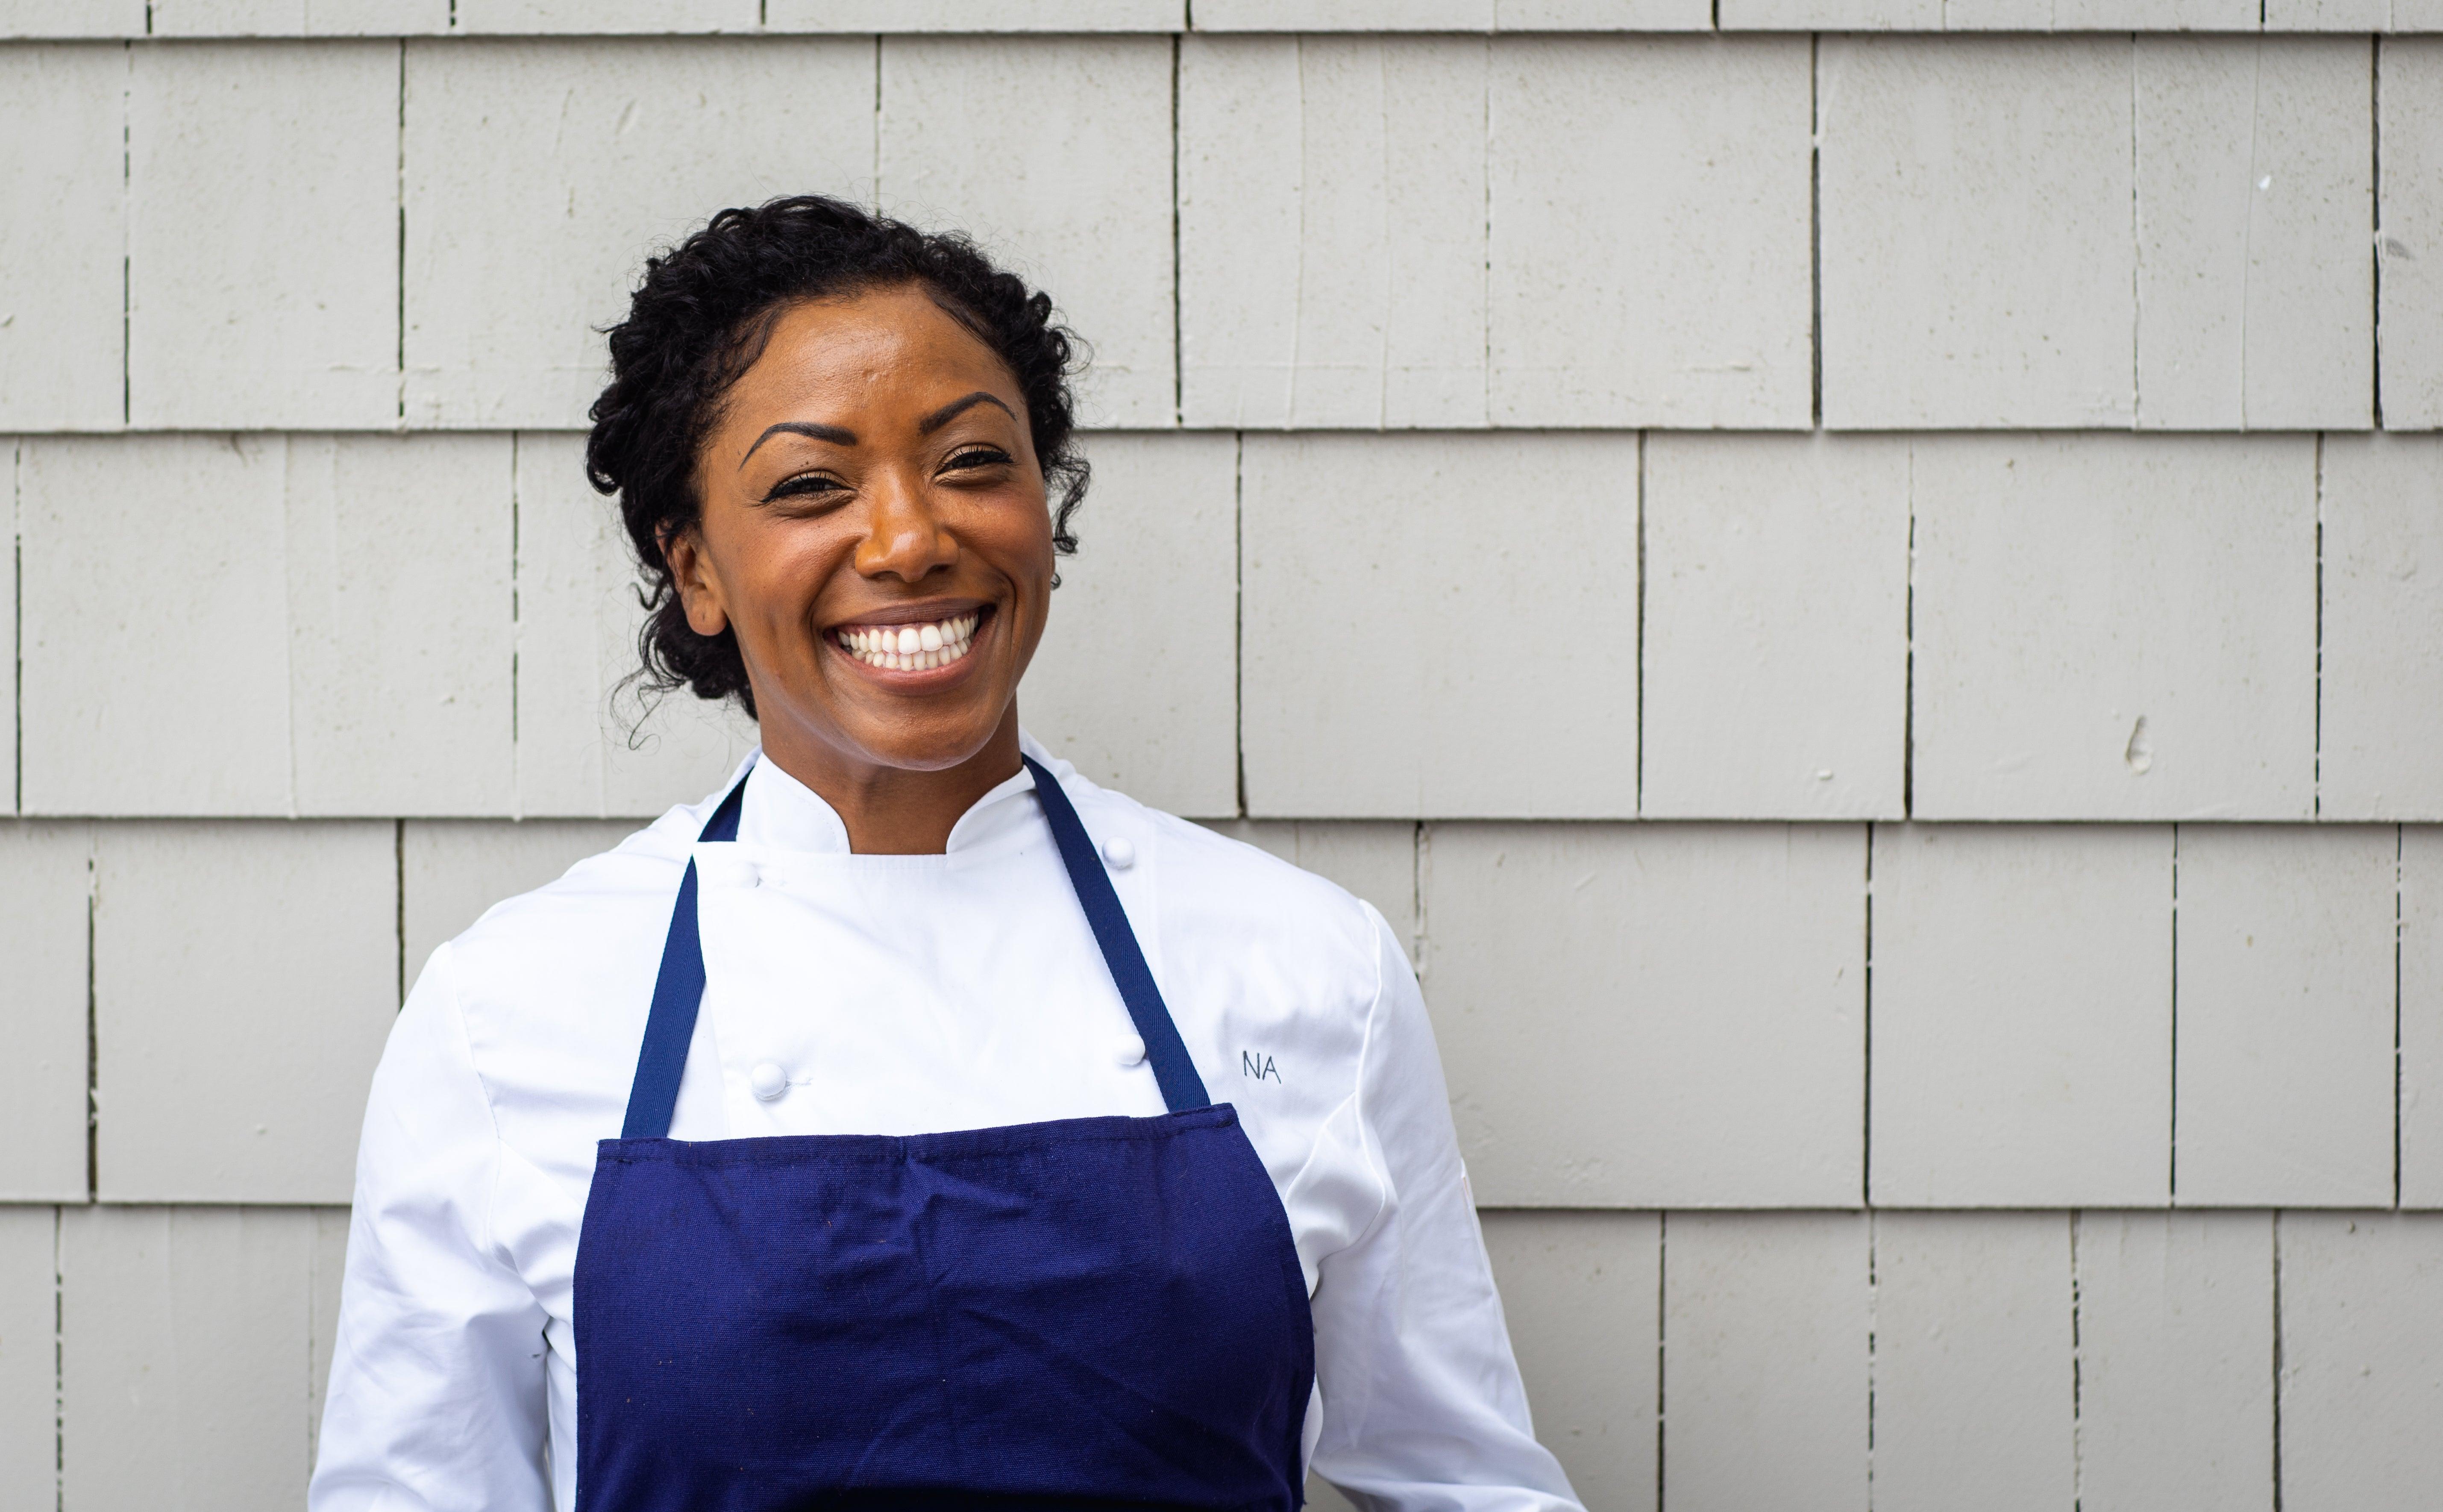 Meet the Changemakers: Chef Nyesha Arrington